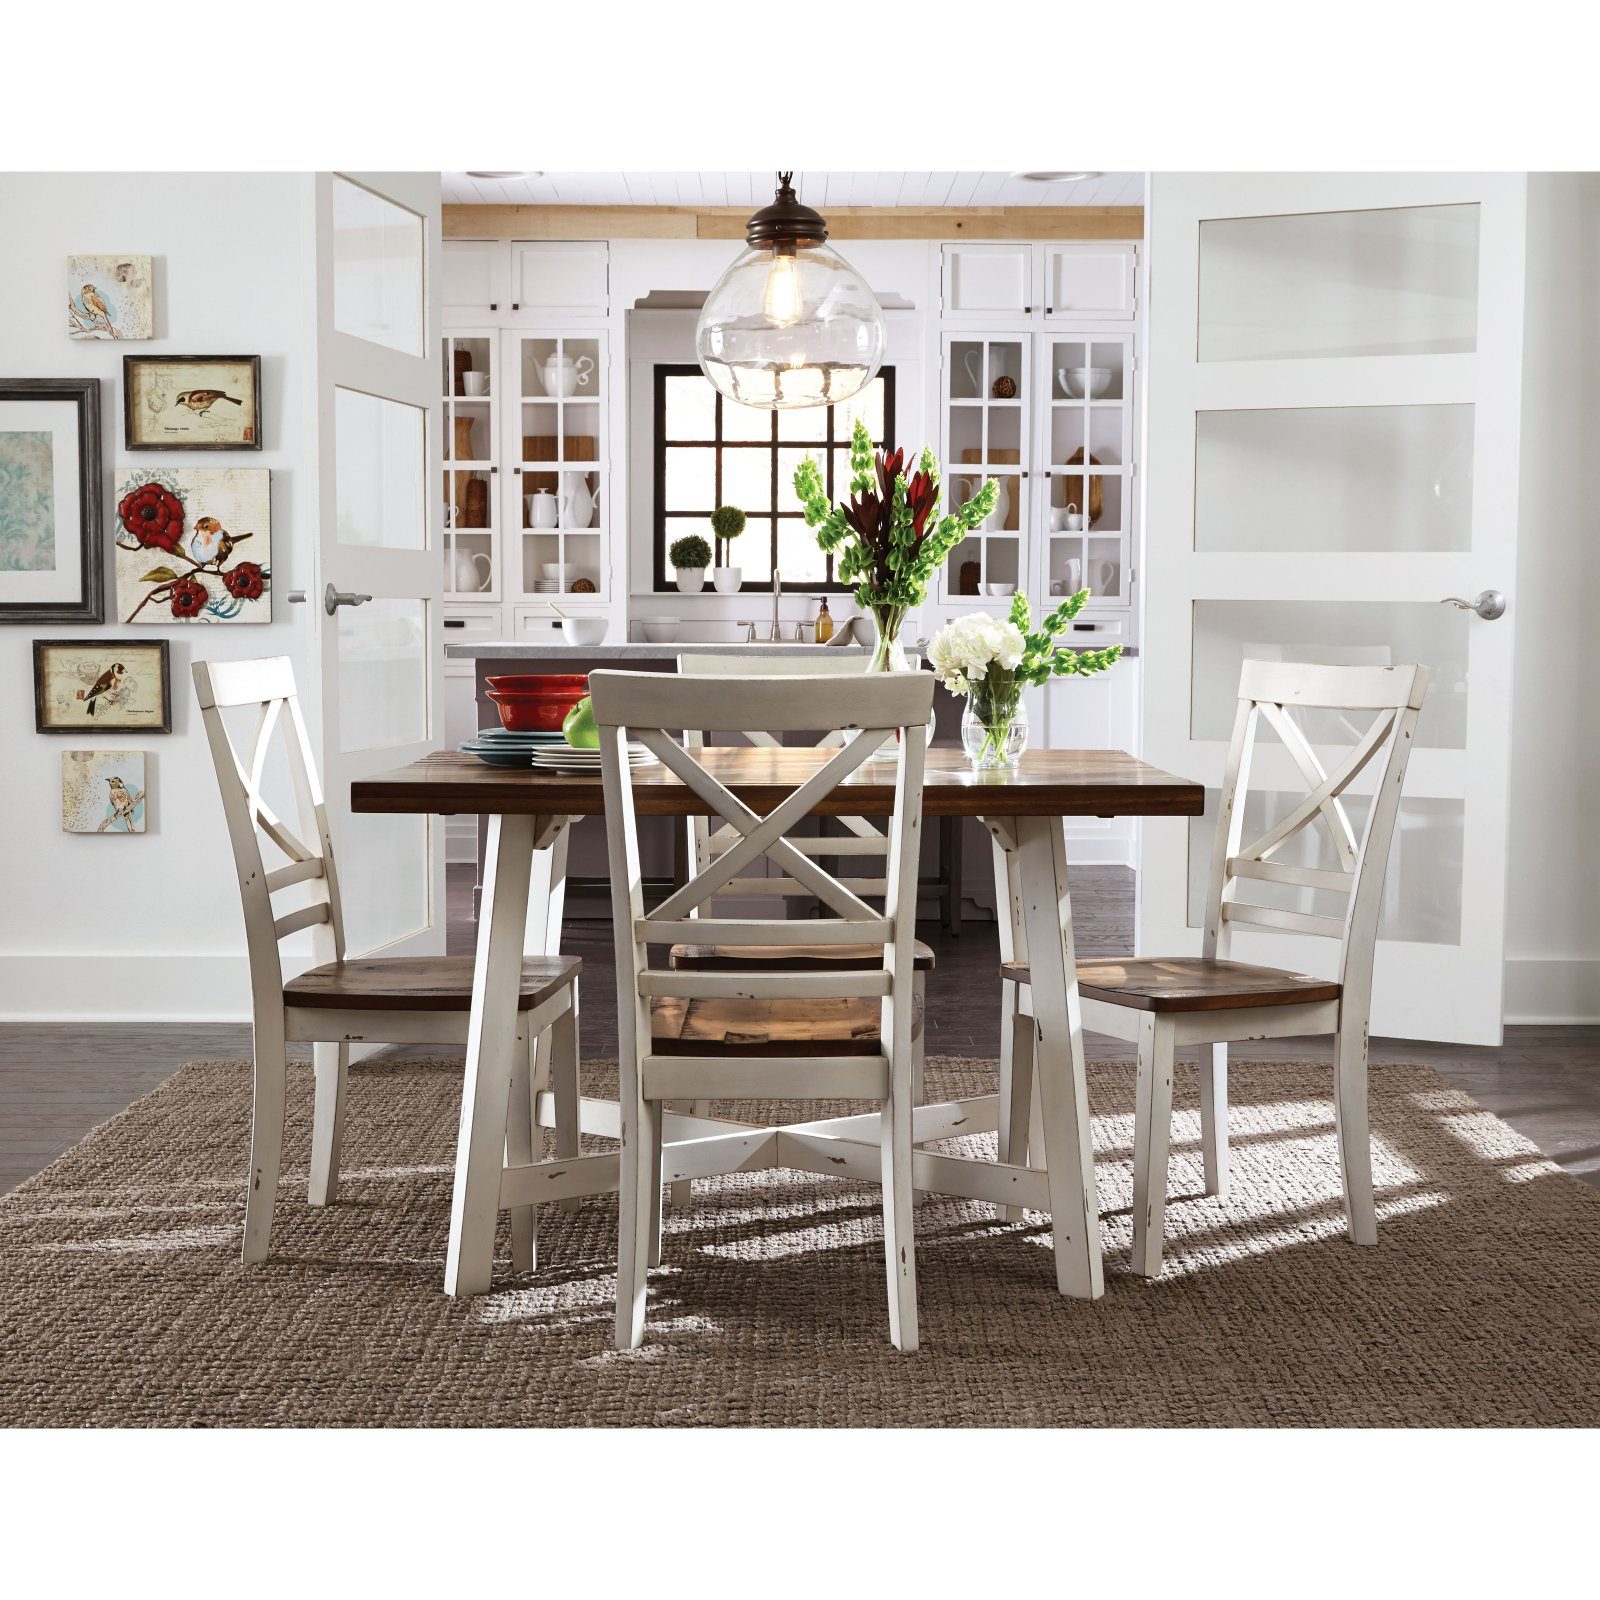 Standard Furniture Amelia 5 Piece Dining Table Set Walmart Com Walmart Com